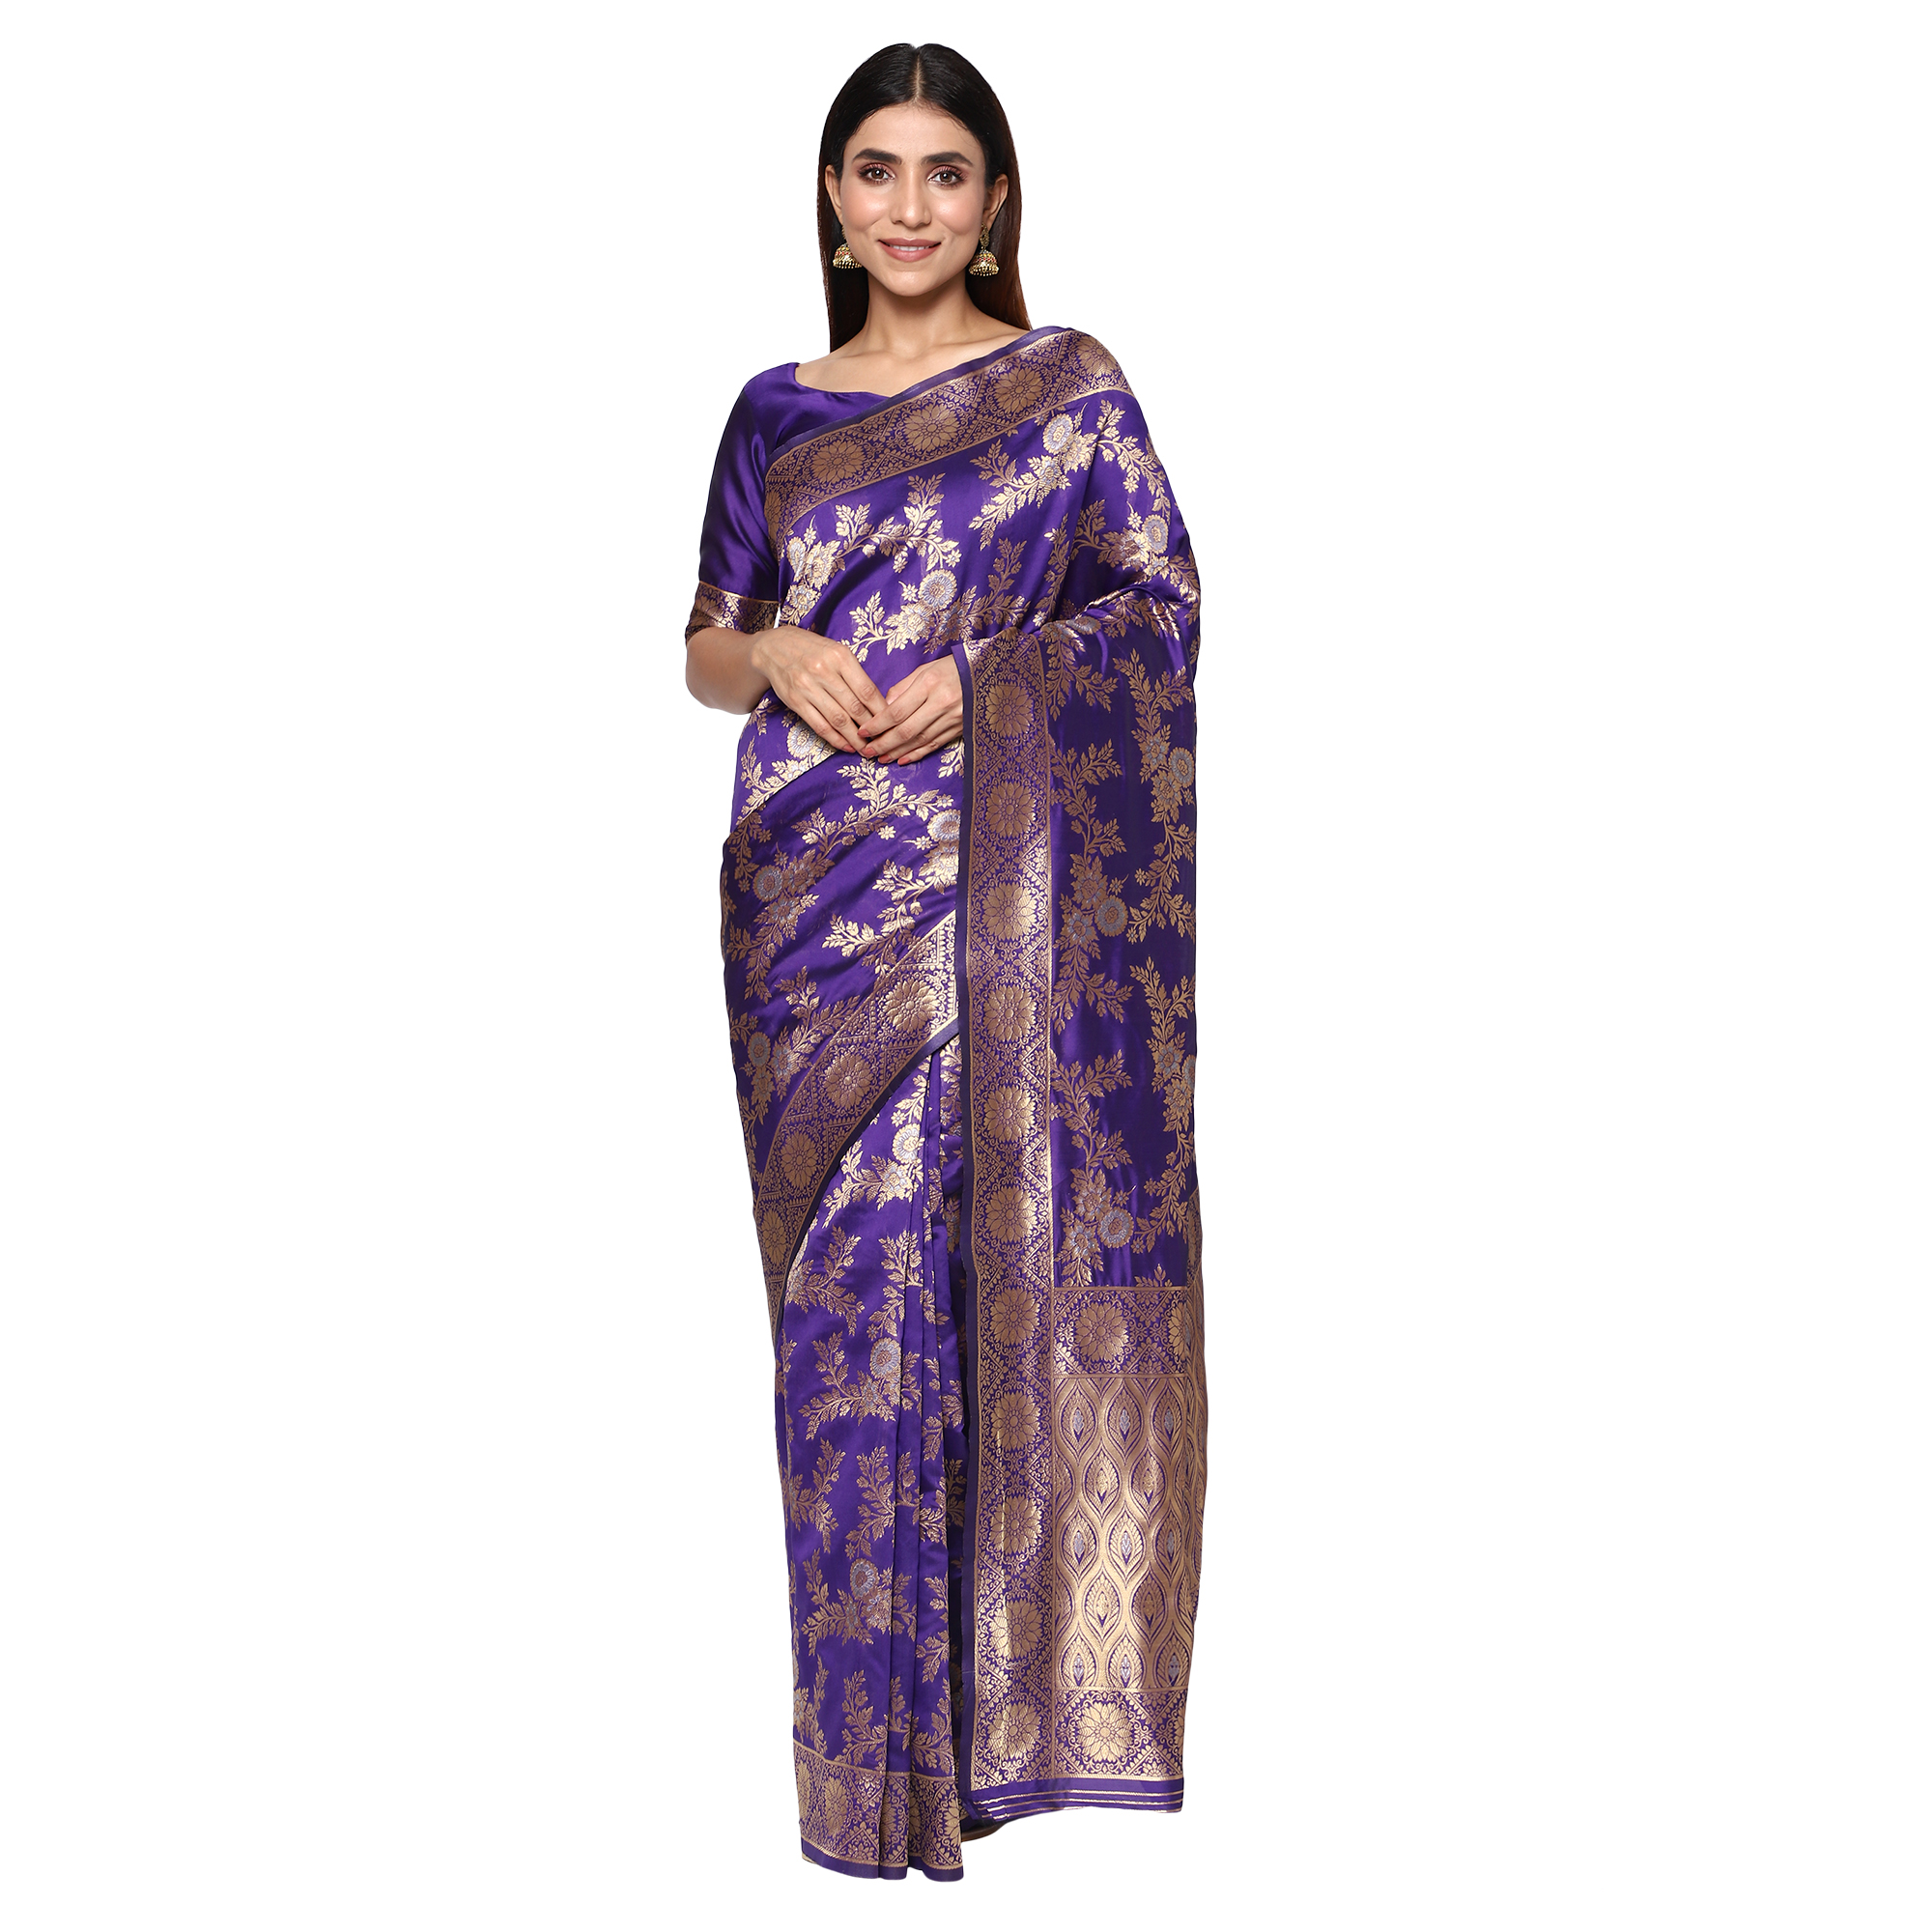 Glemora | Glemora Purple Fancy Ethnic Wear Silk Blend Banarasi Traditional Saree